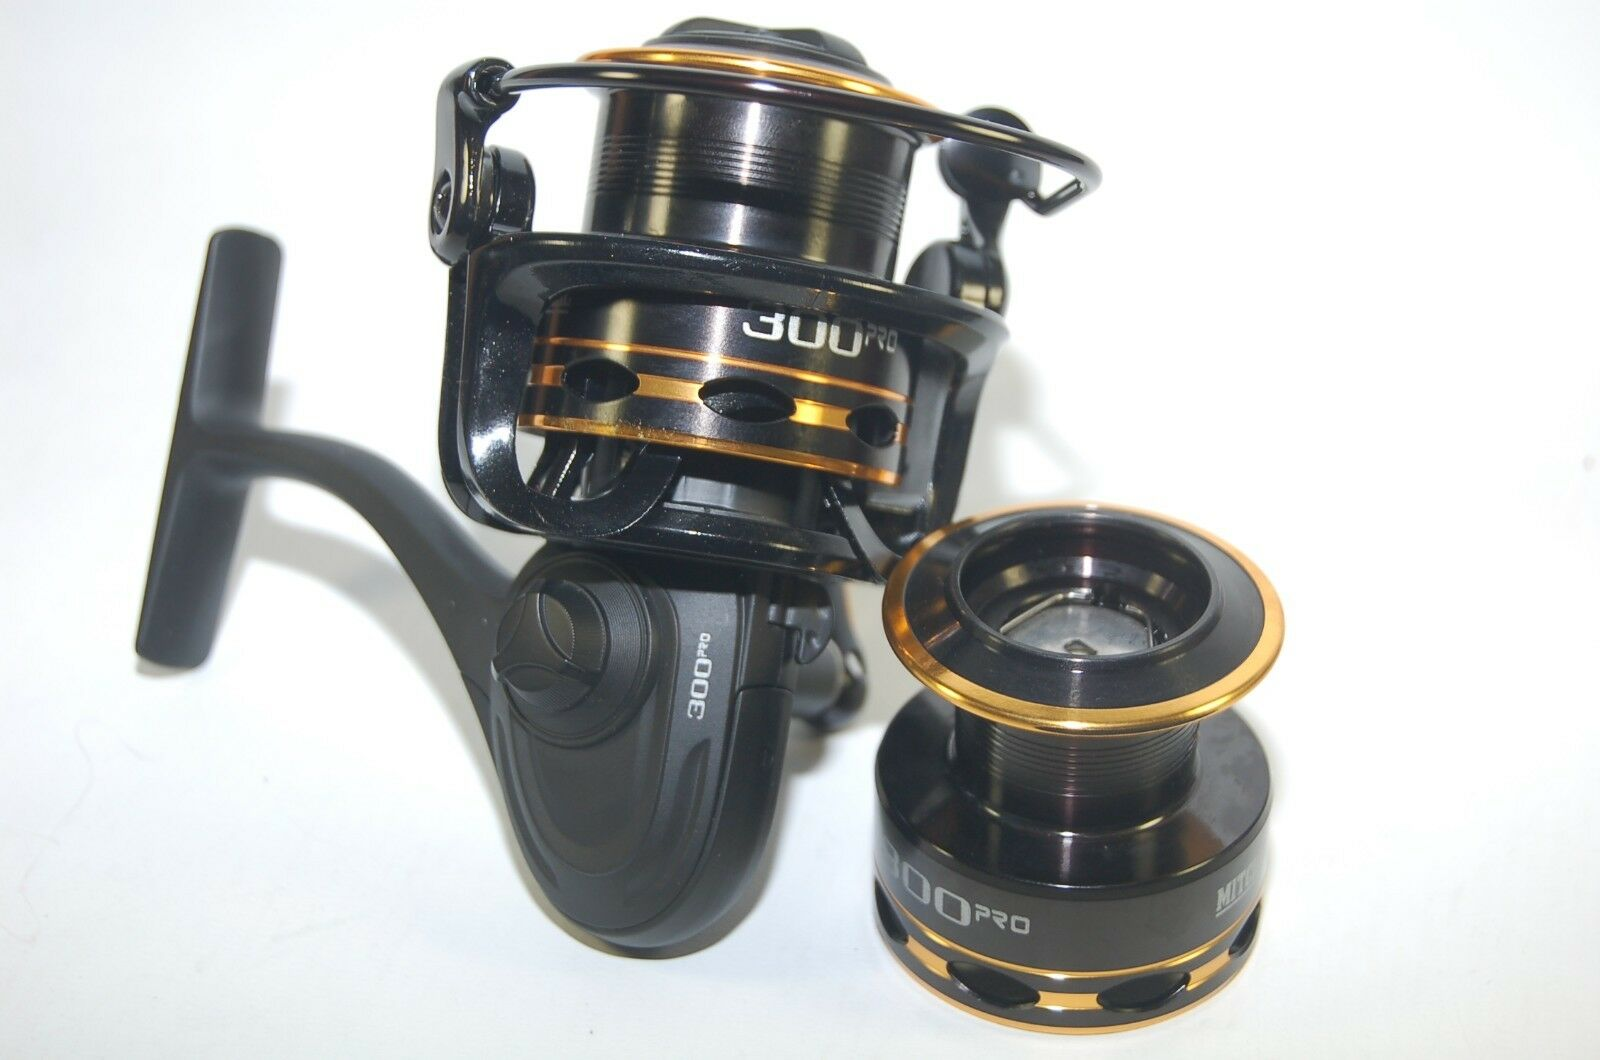 Mitchell Alu 300 Pro New 2018 Staionärrolle Spinnfischen Stippen Alu Mitchell Spule 9+1 Lager 6e2586